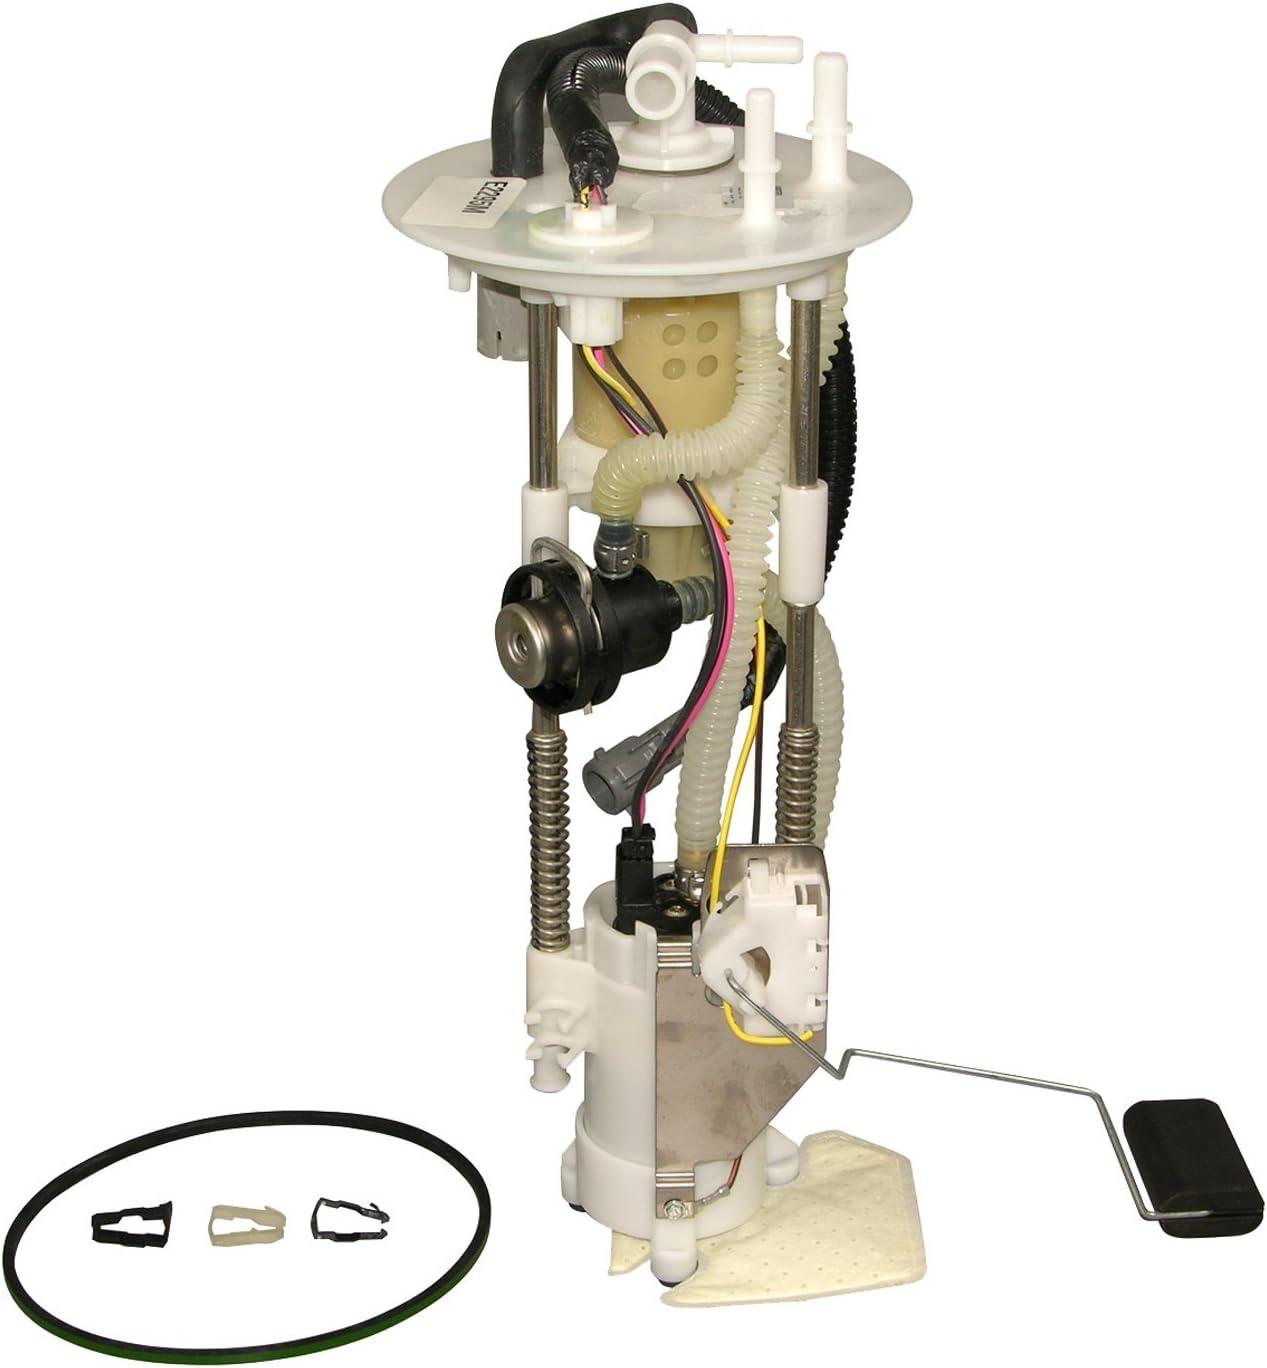 Airtex E2295M Fuel Pump Assembly New item Module Many popular brands